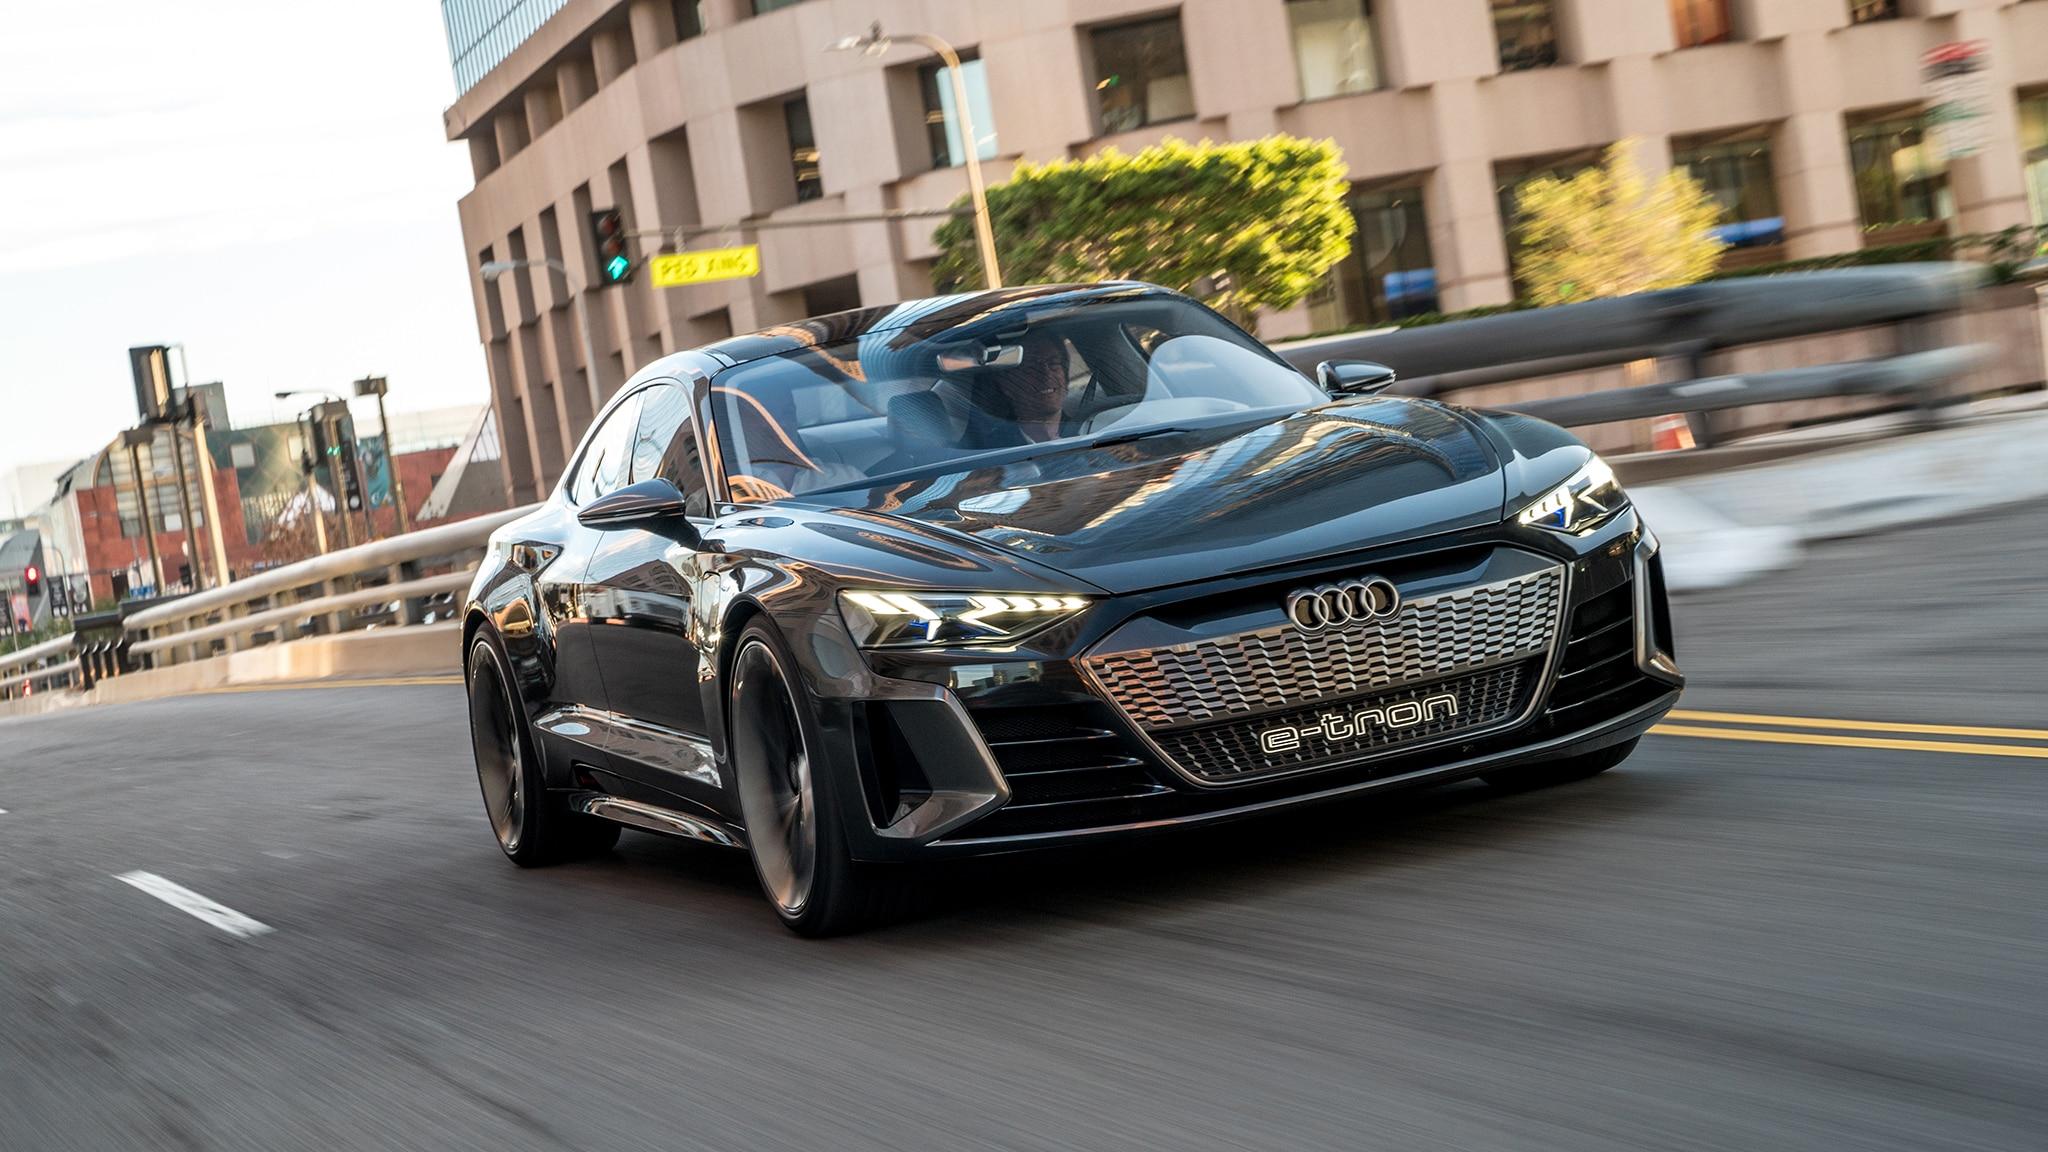 Audi Confirms A4-Sized e-tron GT Electric Sedan | Car in ...